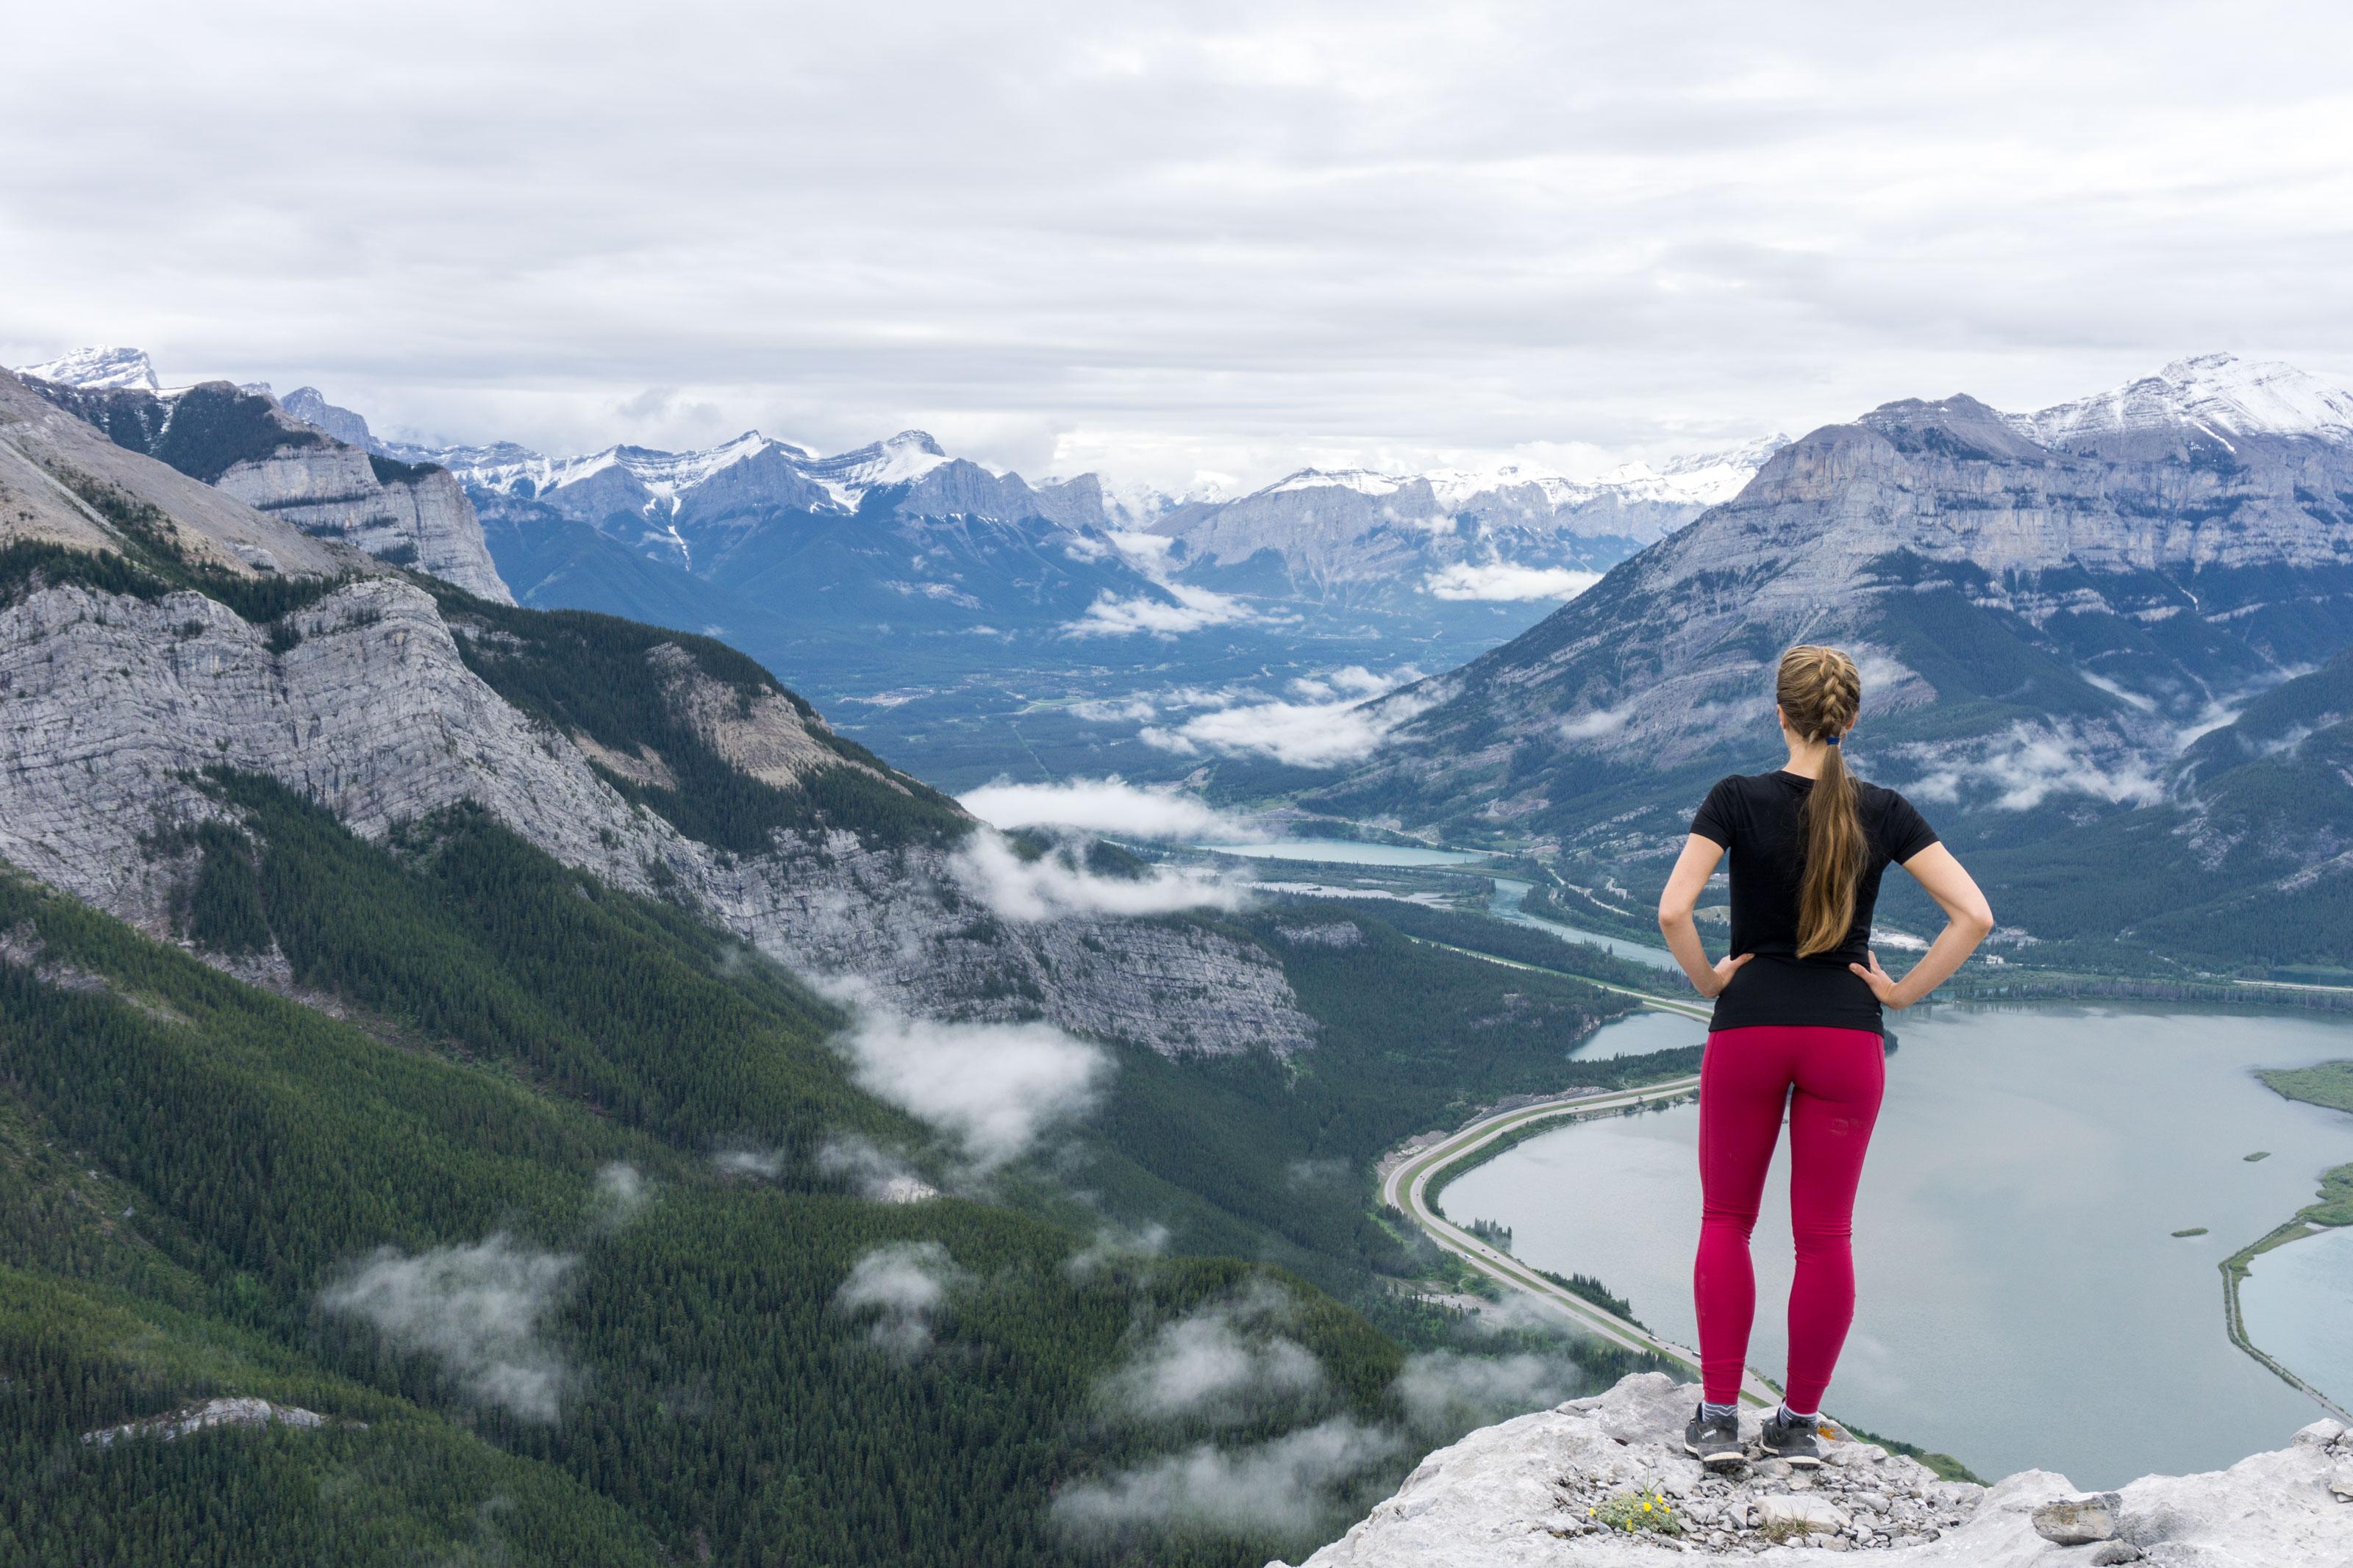 Hřebenovka nad Bow Valley přes Heart Mountain a Grant MacEwan Peak